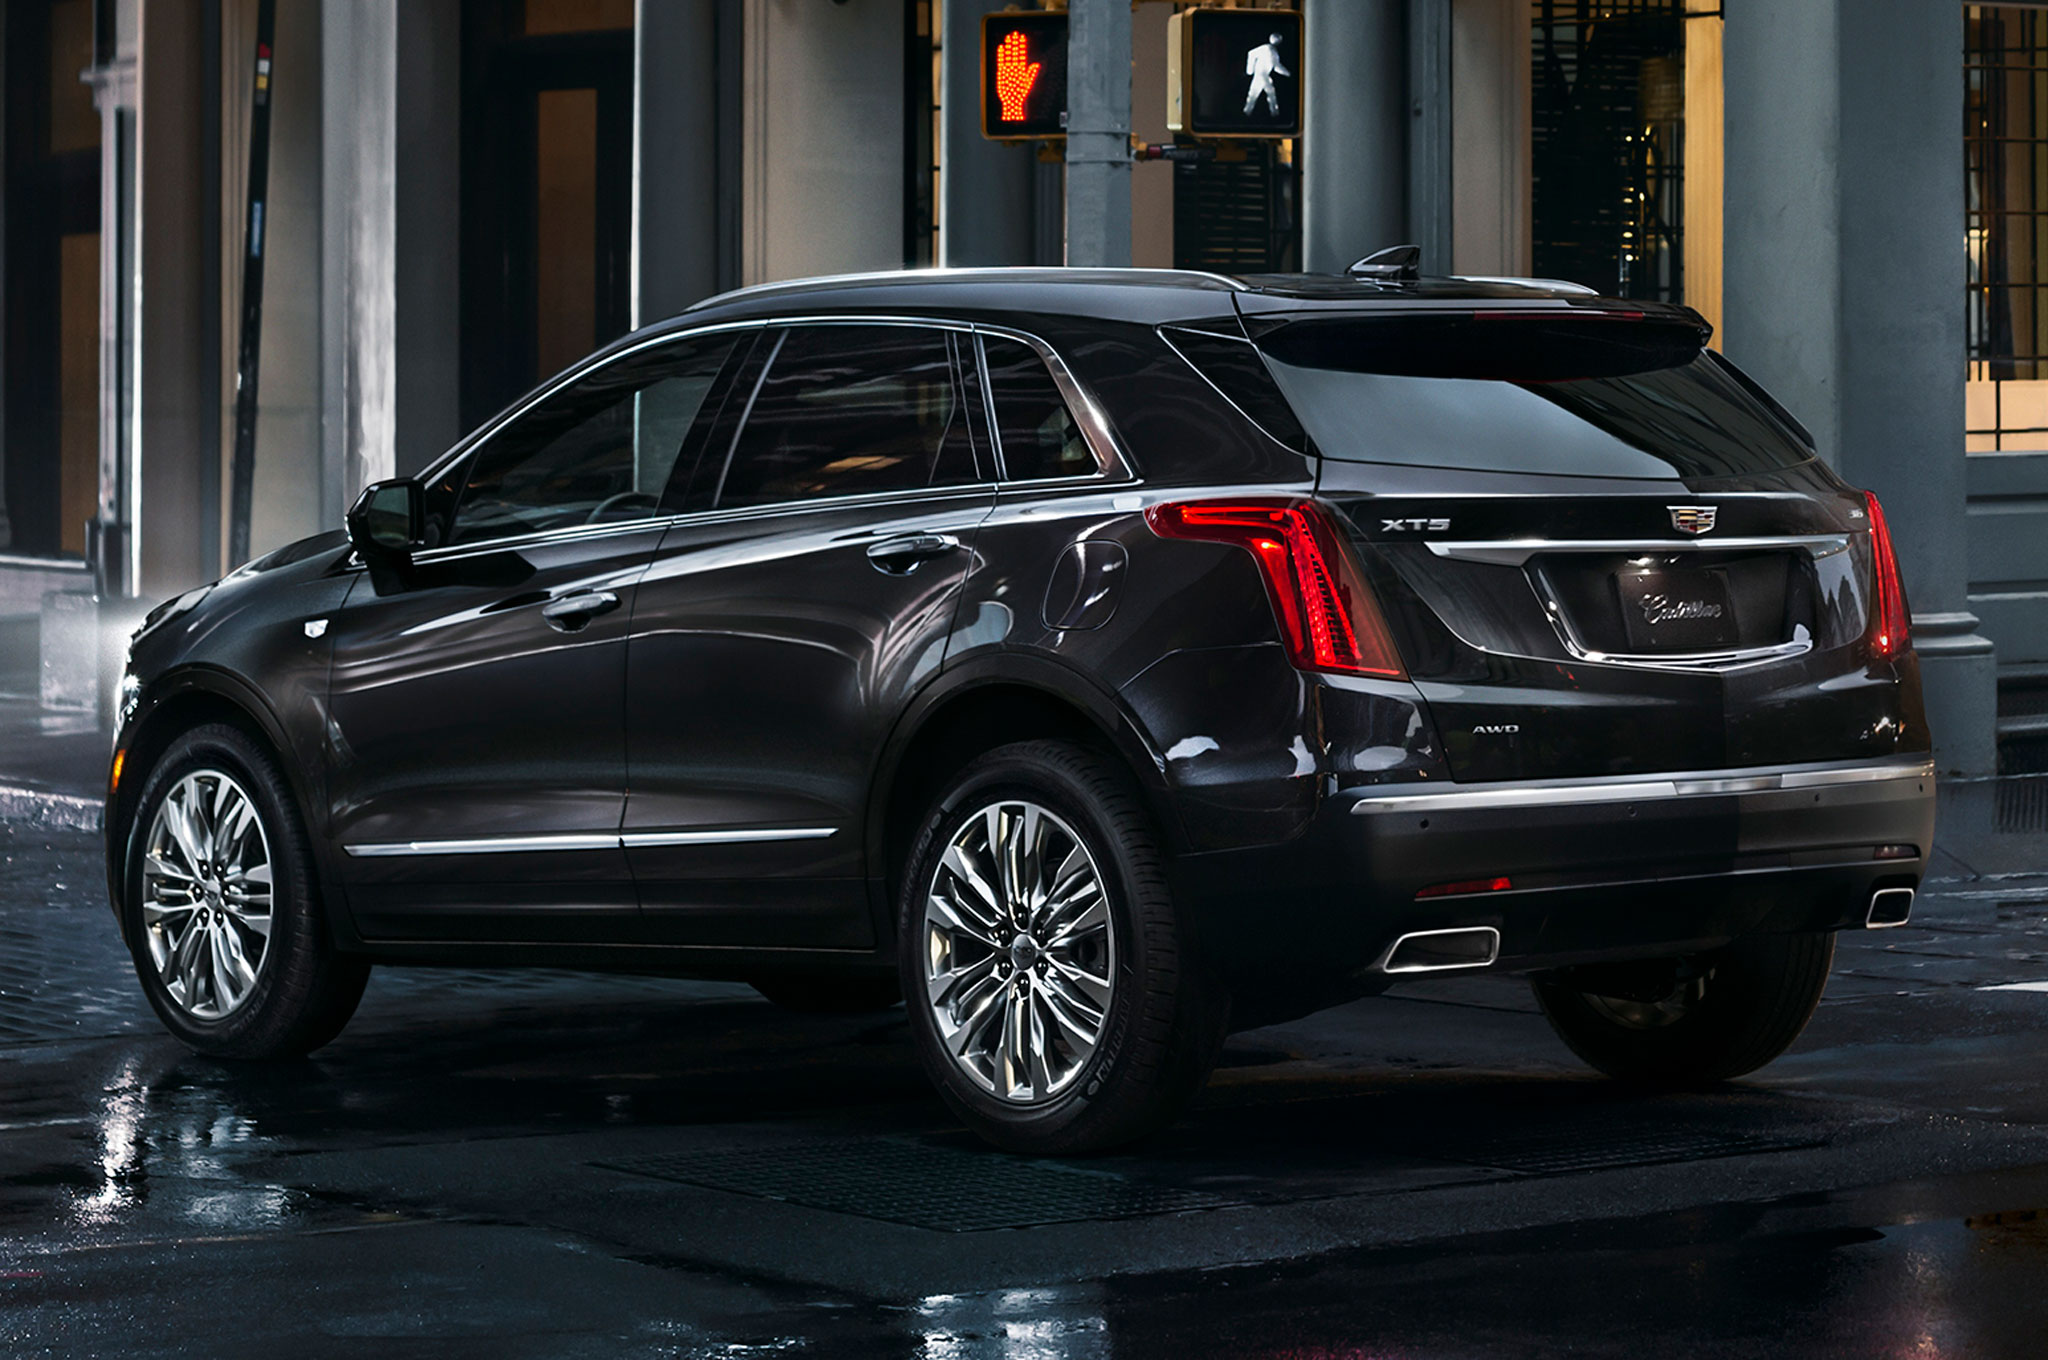 2017 Cadillac XT5 rear side view